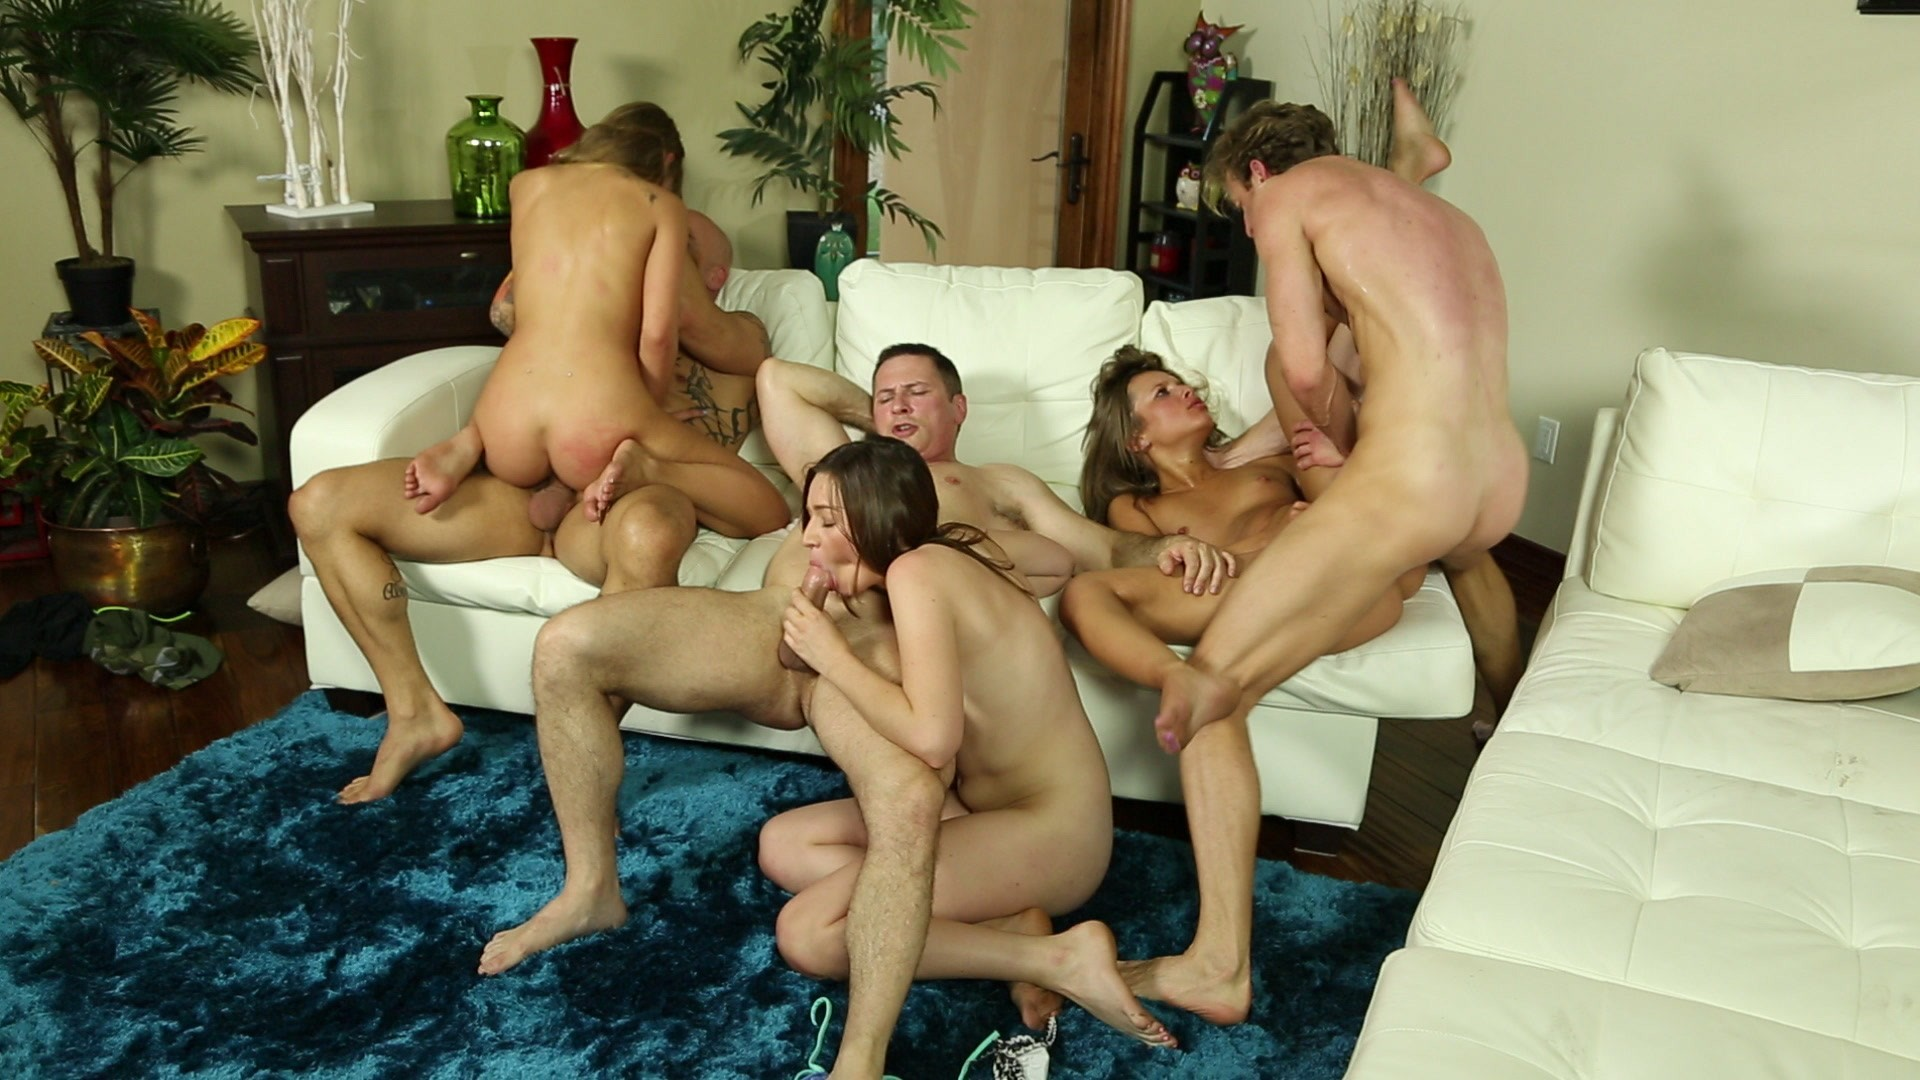 Xxx онлайн сходка секс свингеров